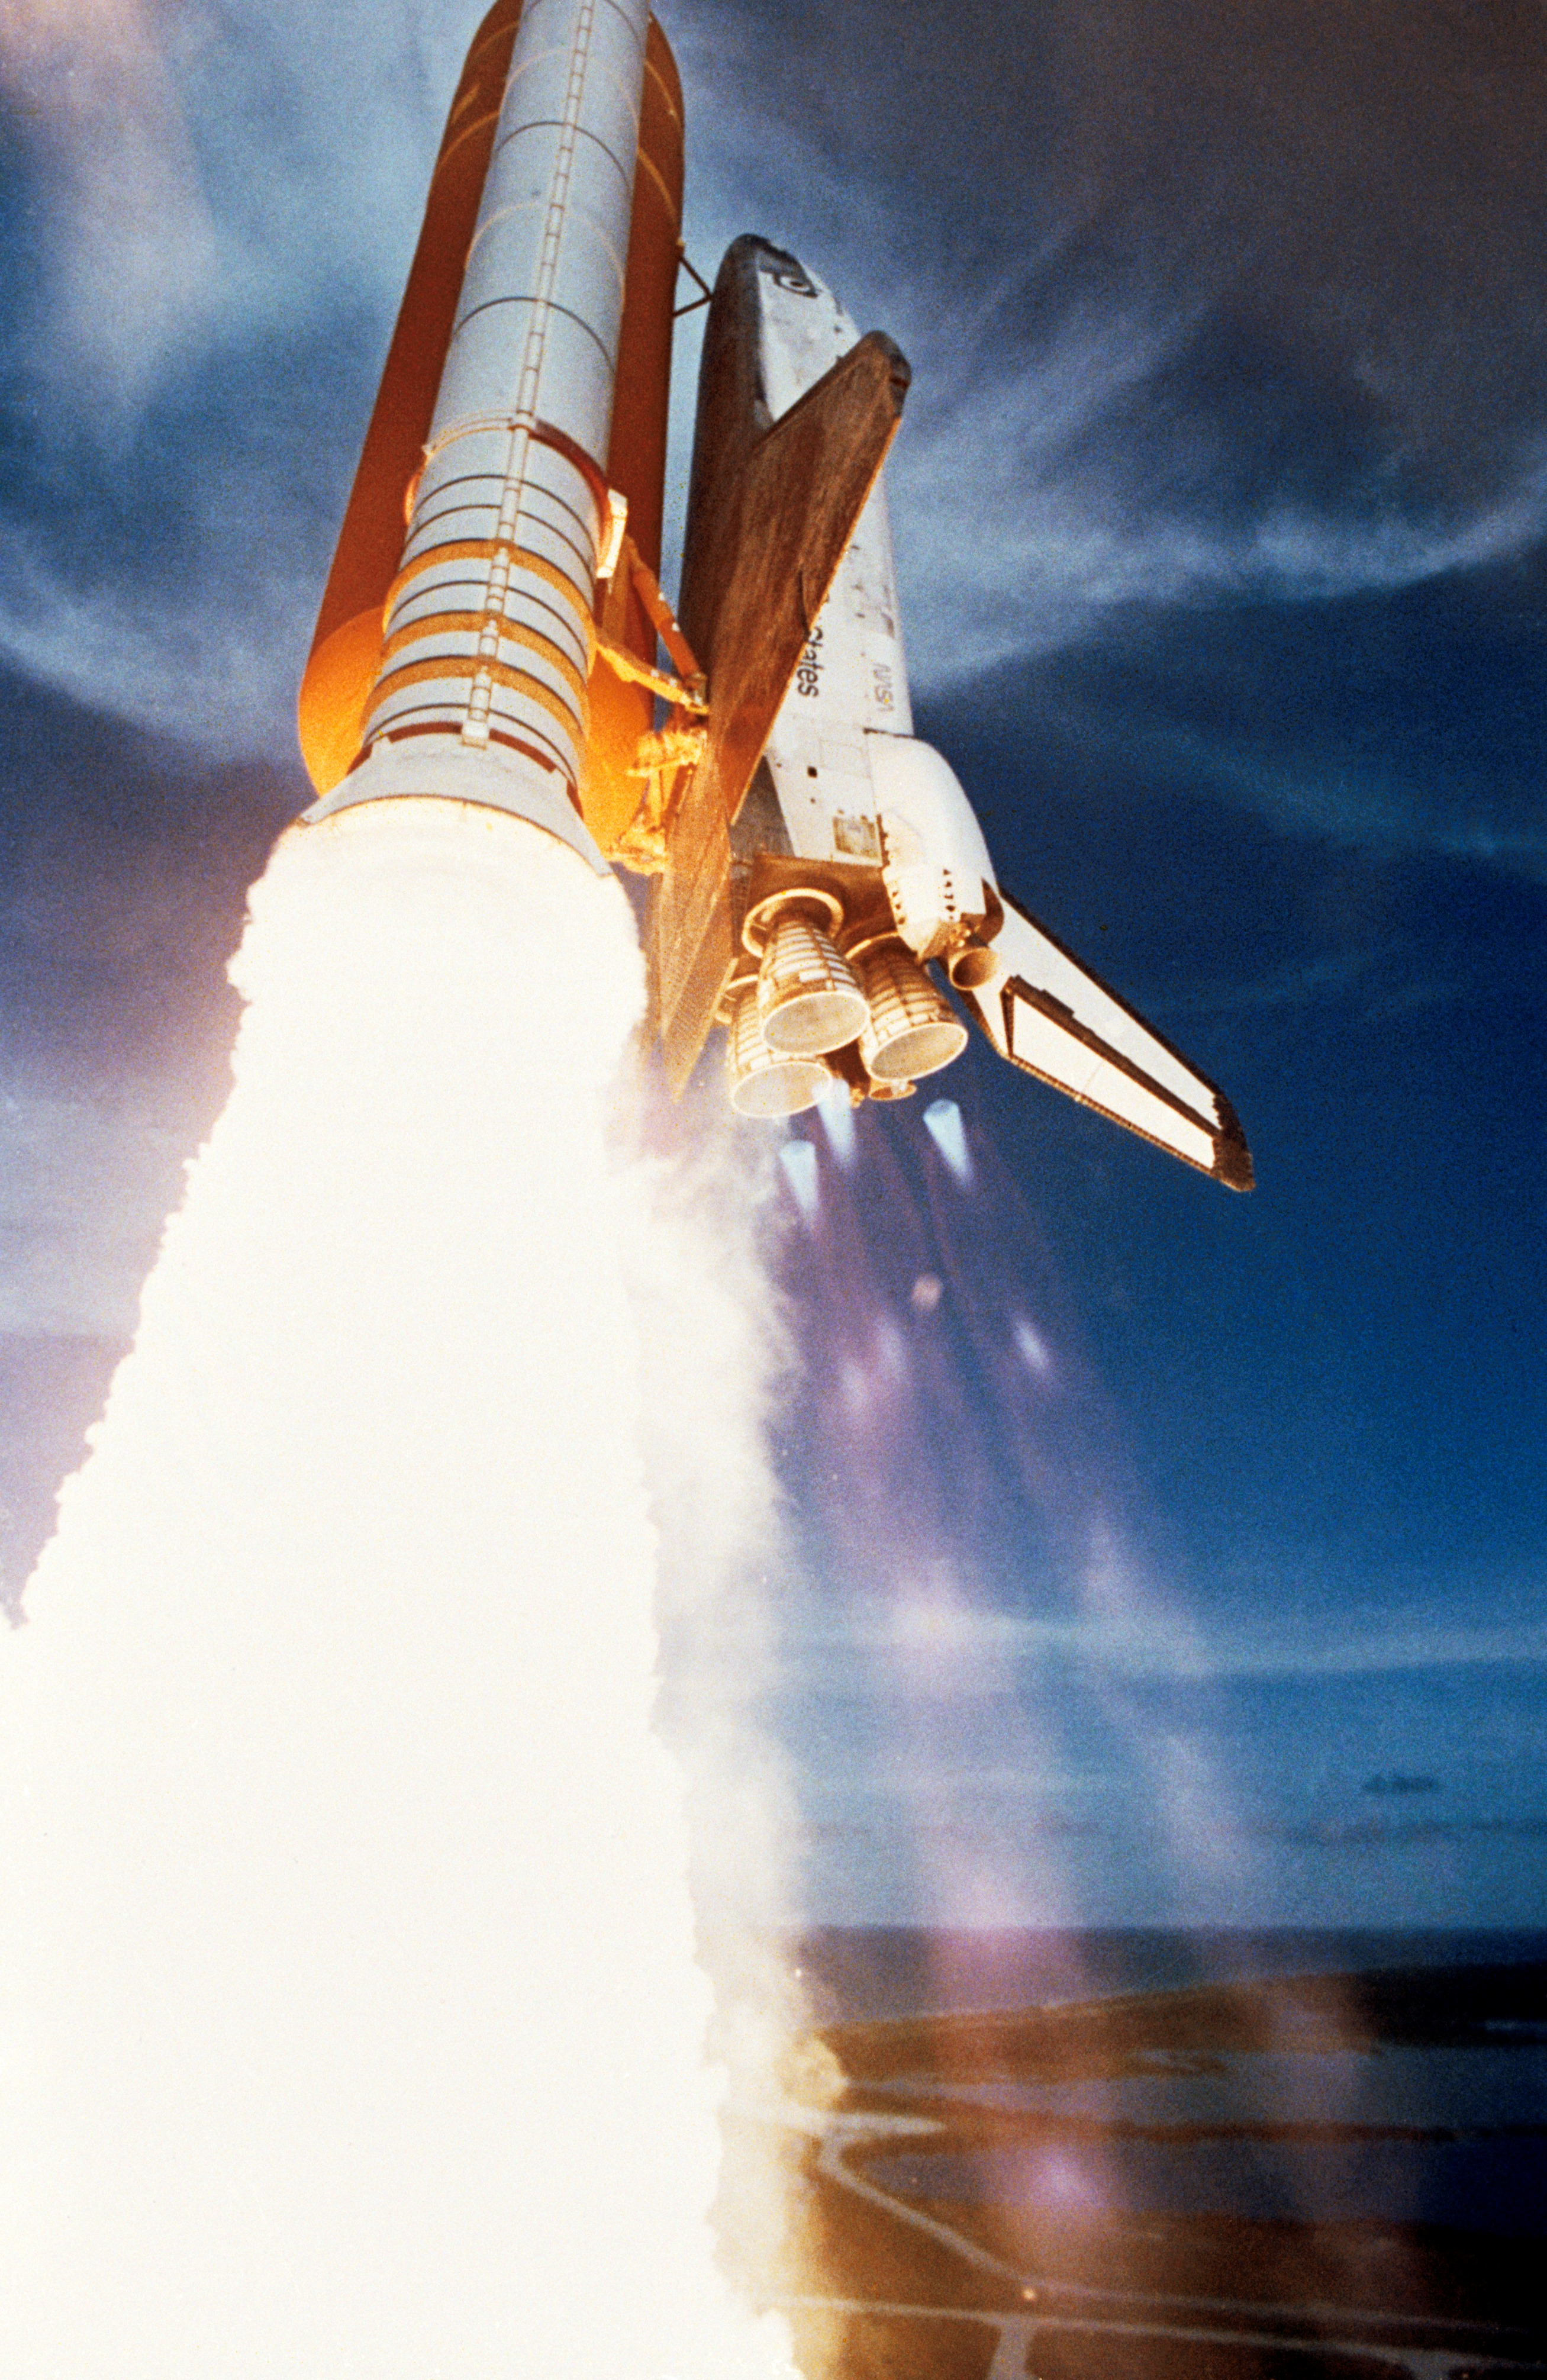 Sts F Launch Abort Landing | Download Lengkap